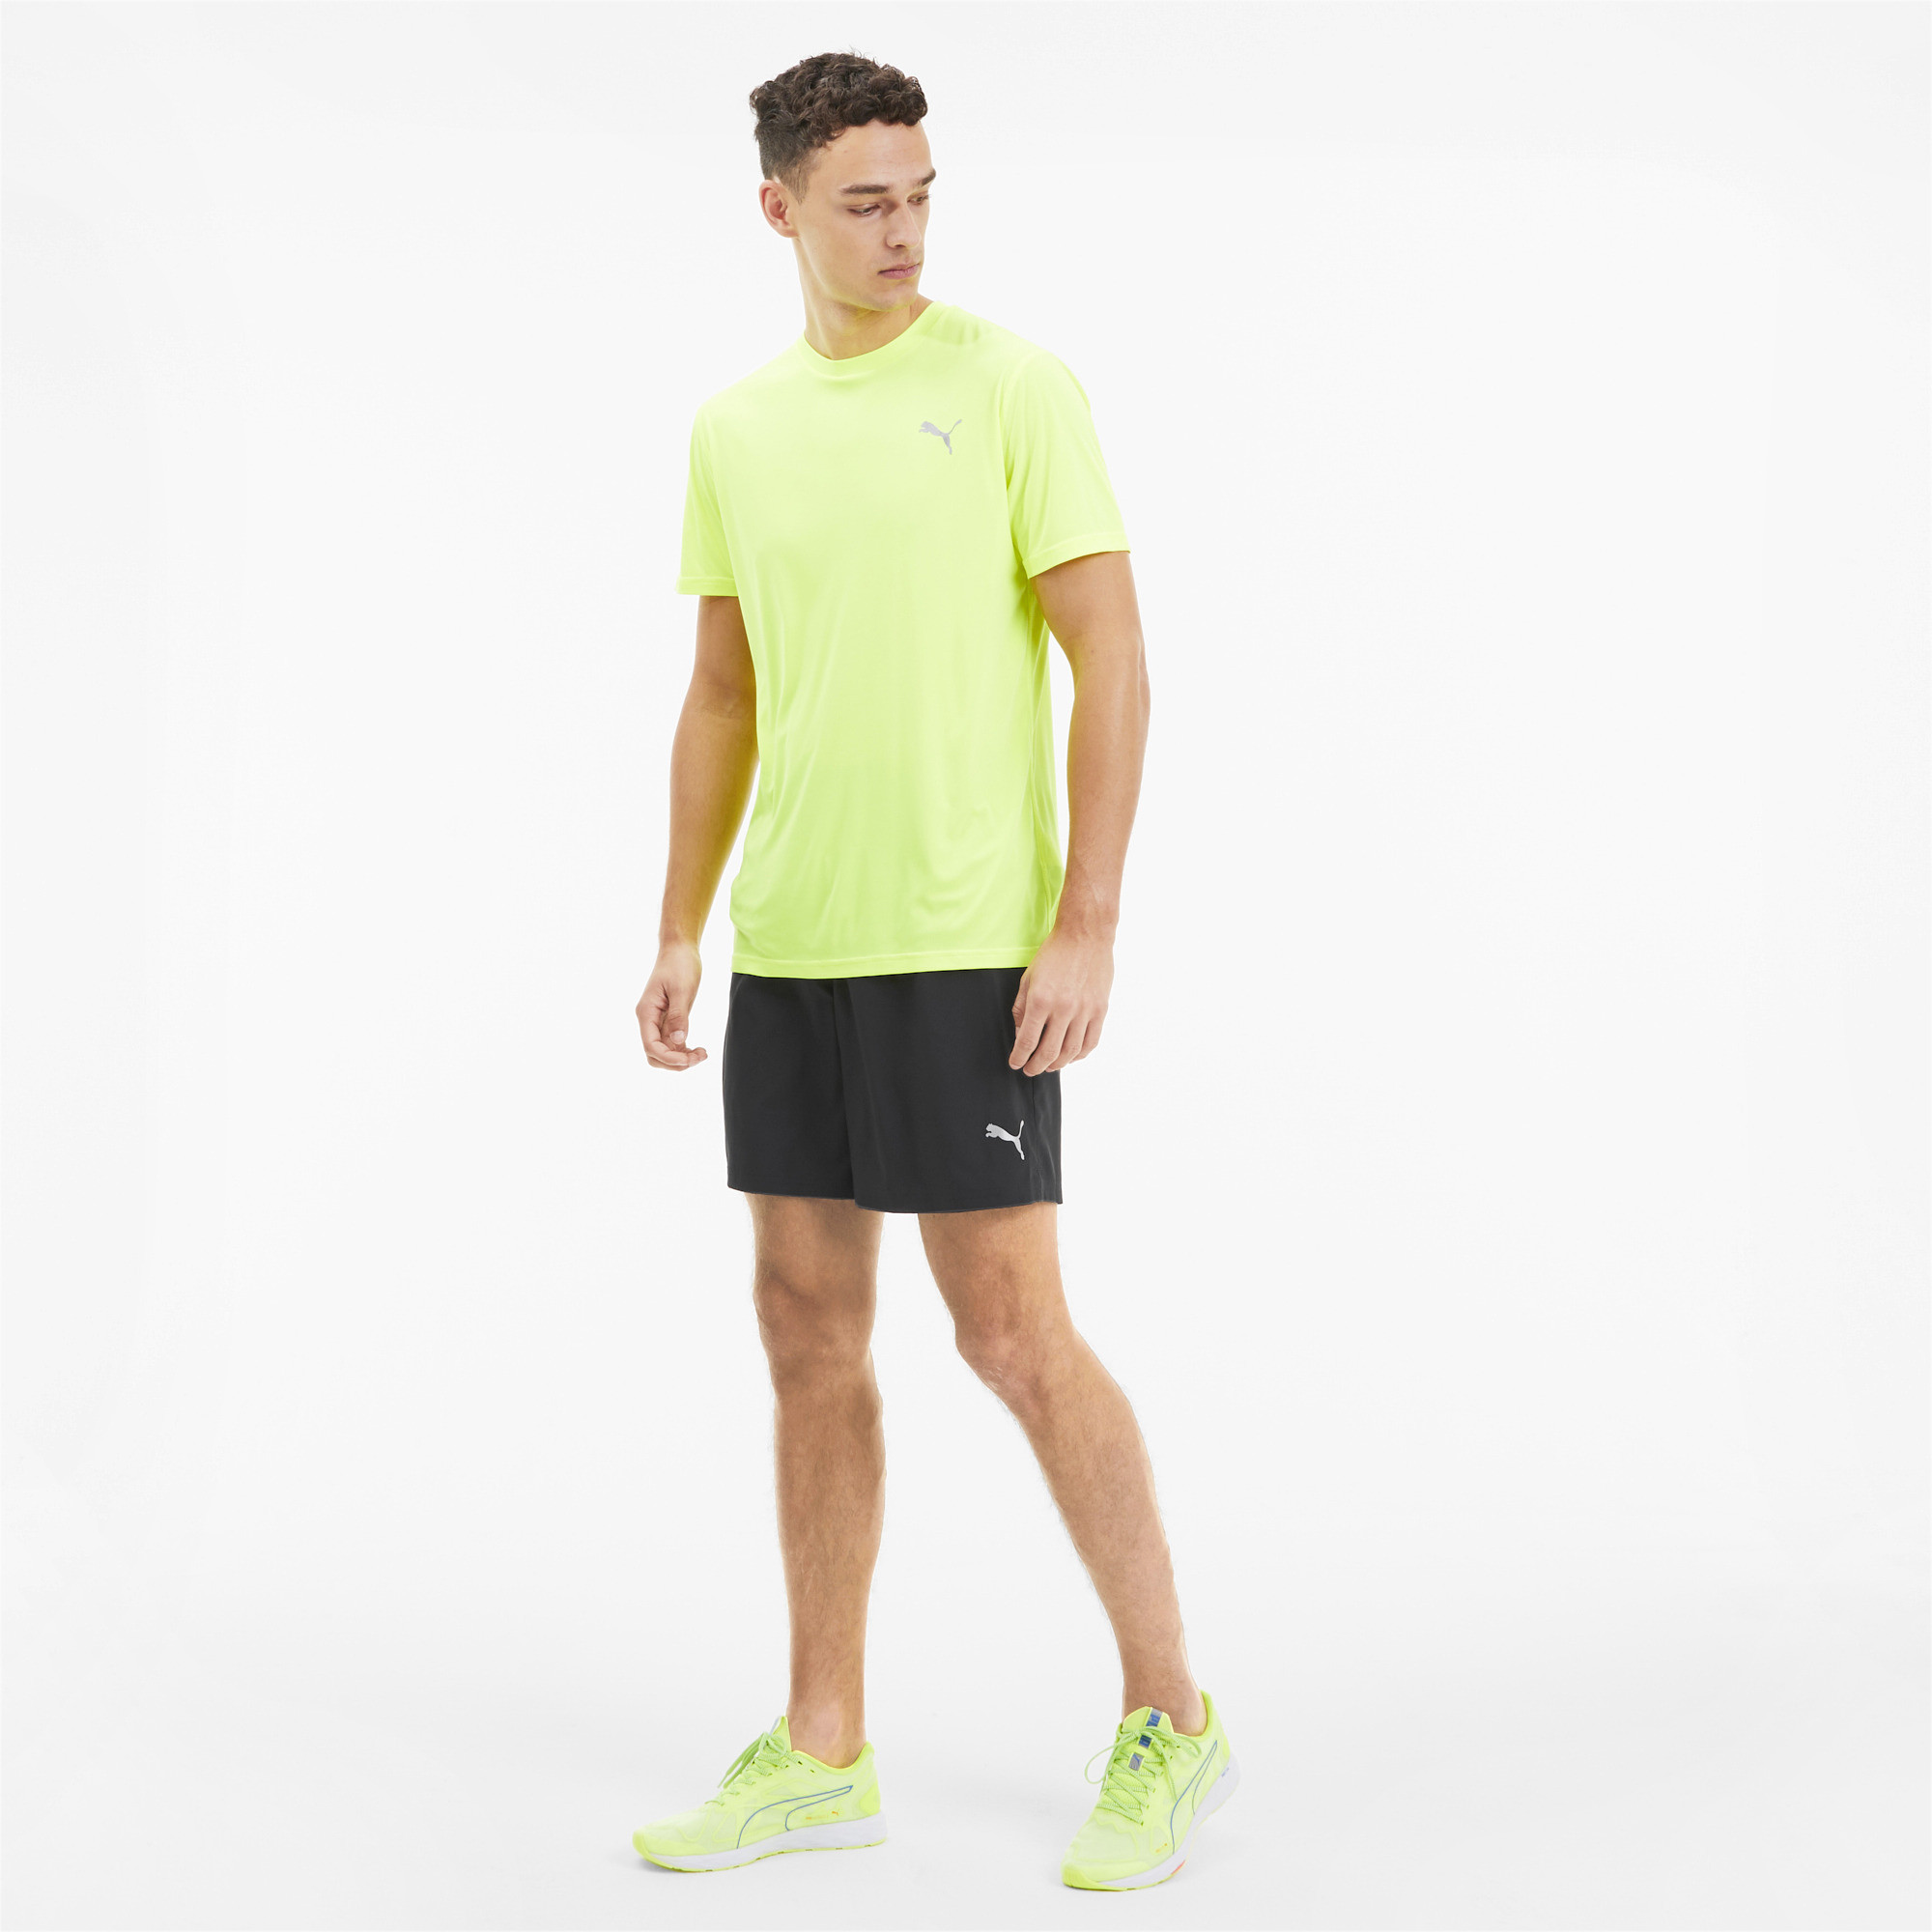 Skins DNAmic Superpose 2 In 1 Womens Running Shorts Black